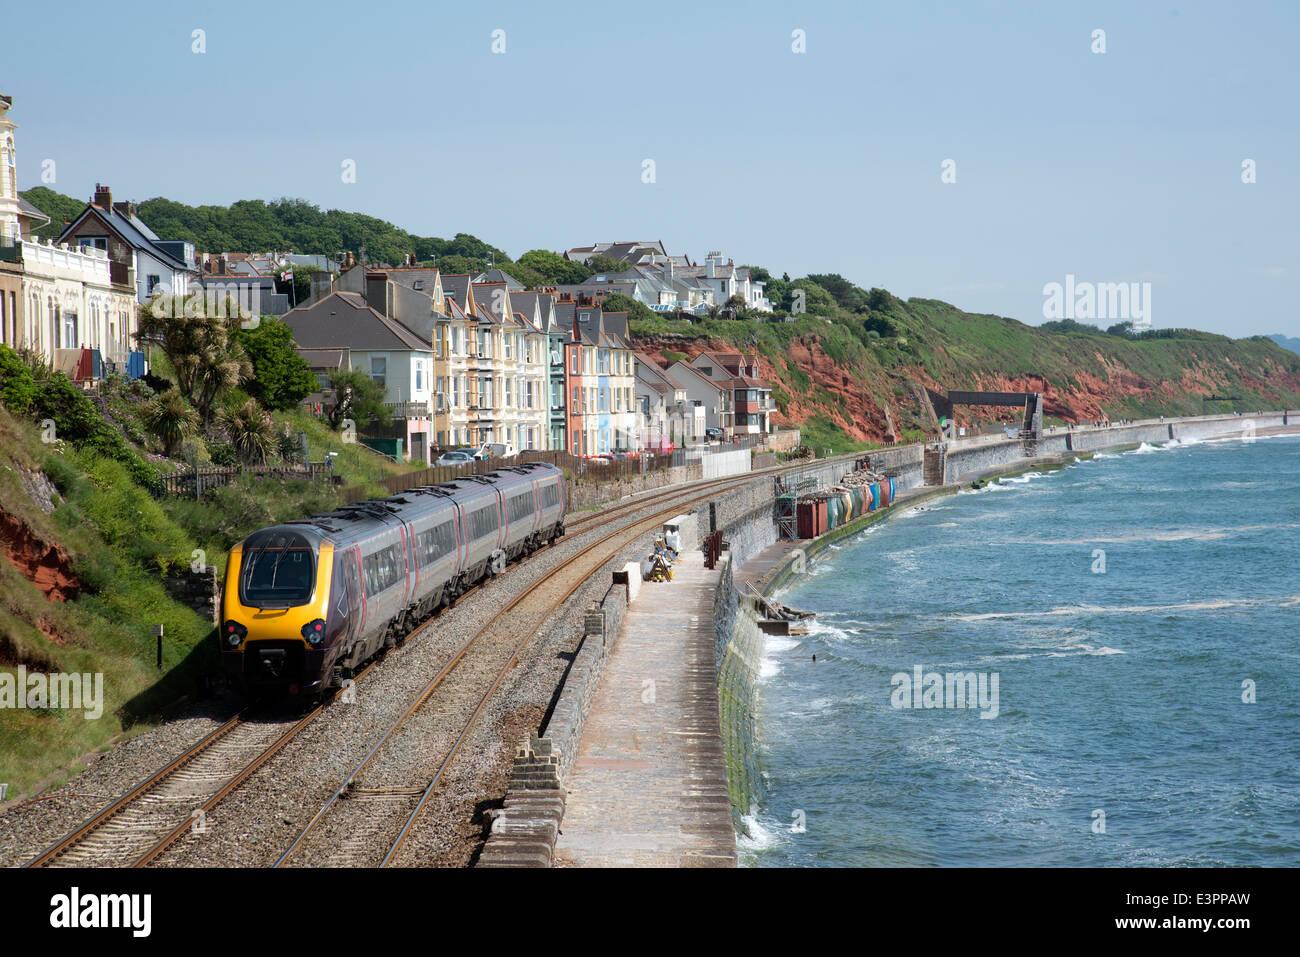 Cross country service passenger train at Dawlish Devon UK Stock Photo